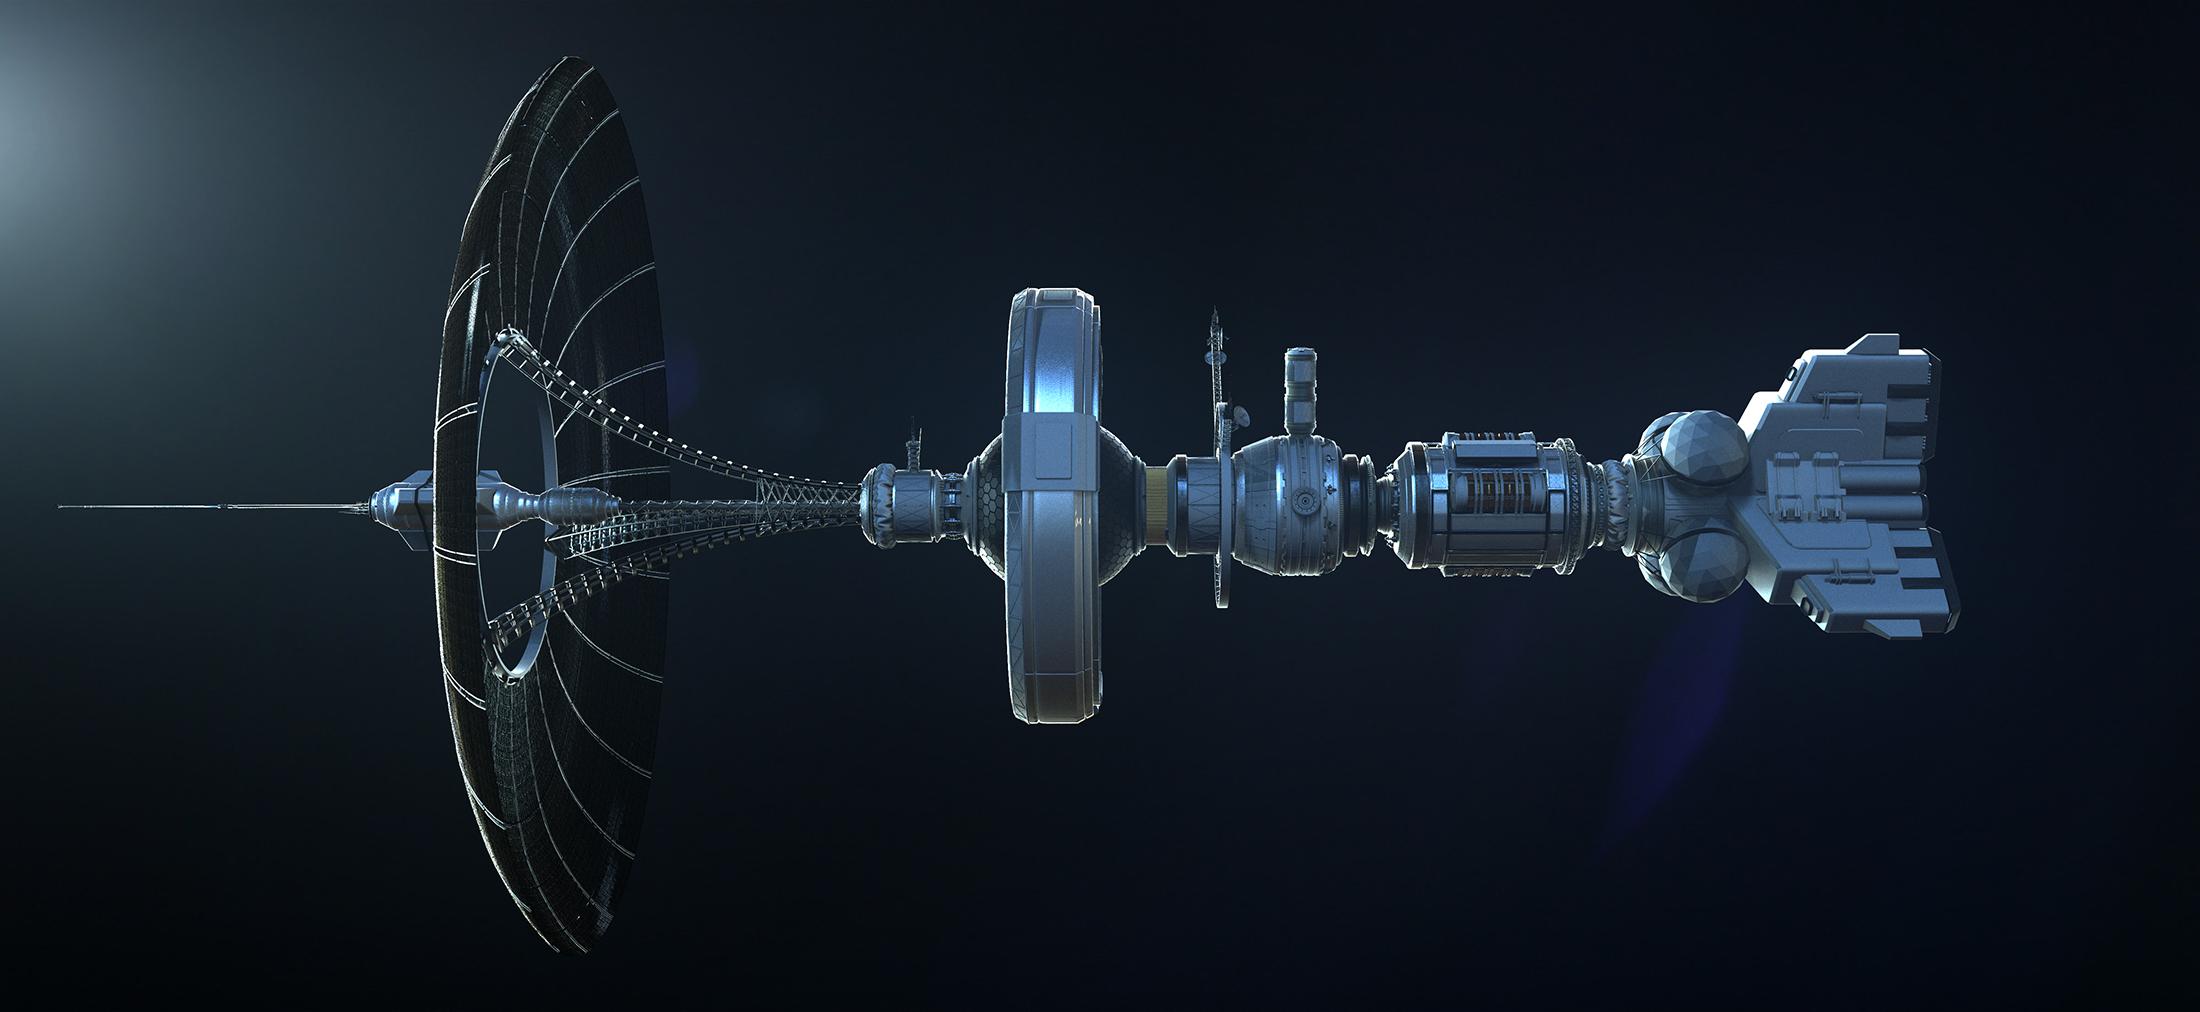 Space ship_02.jpg